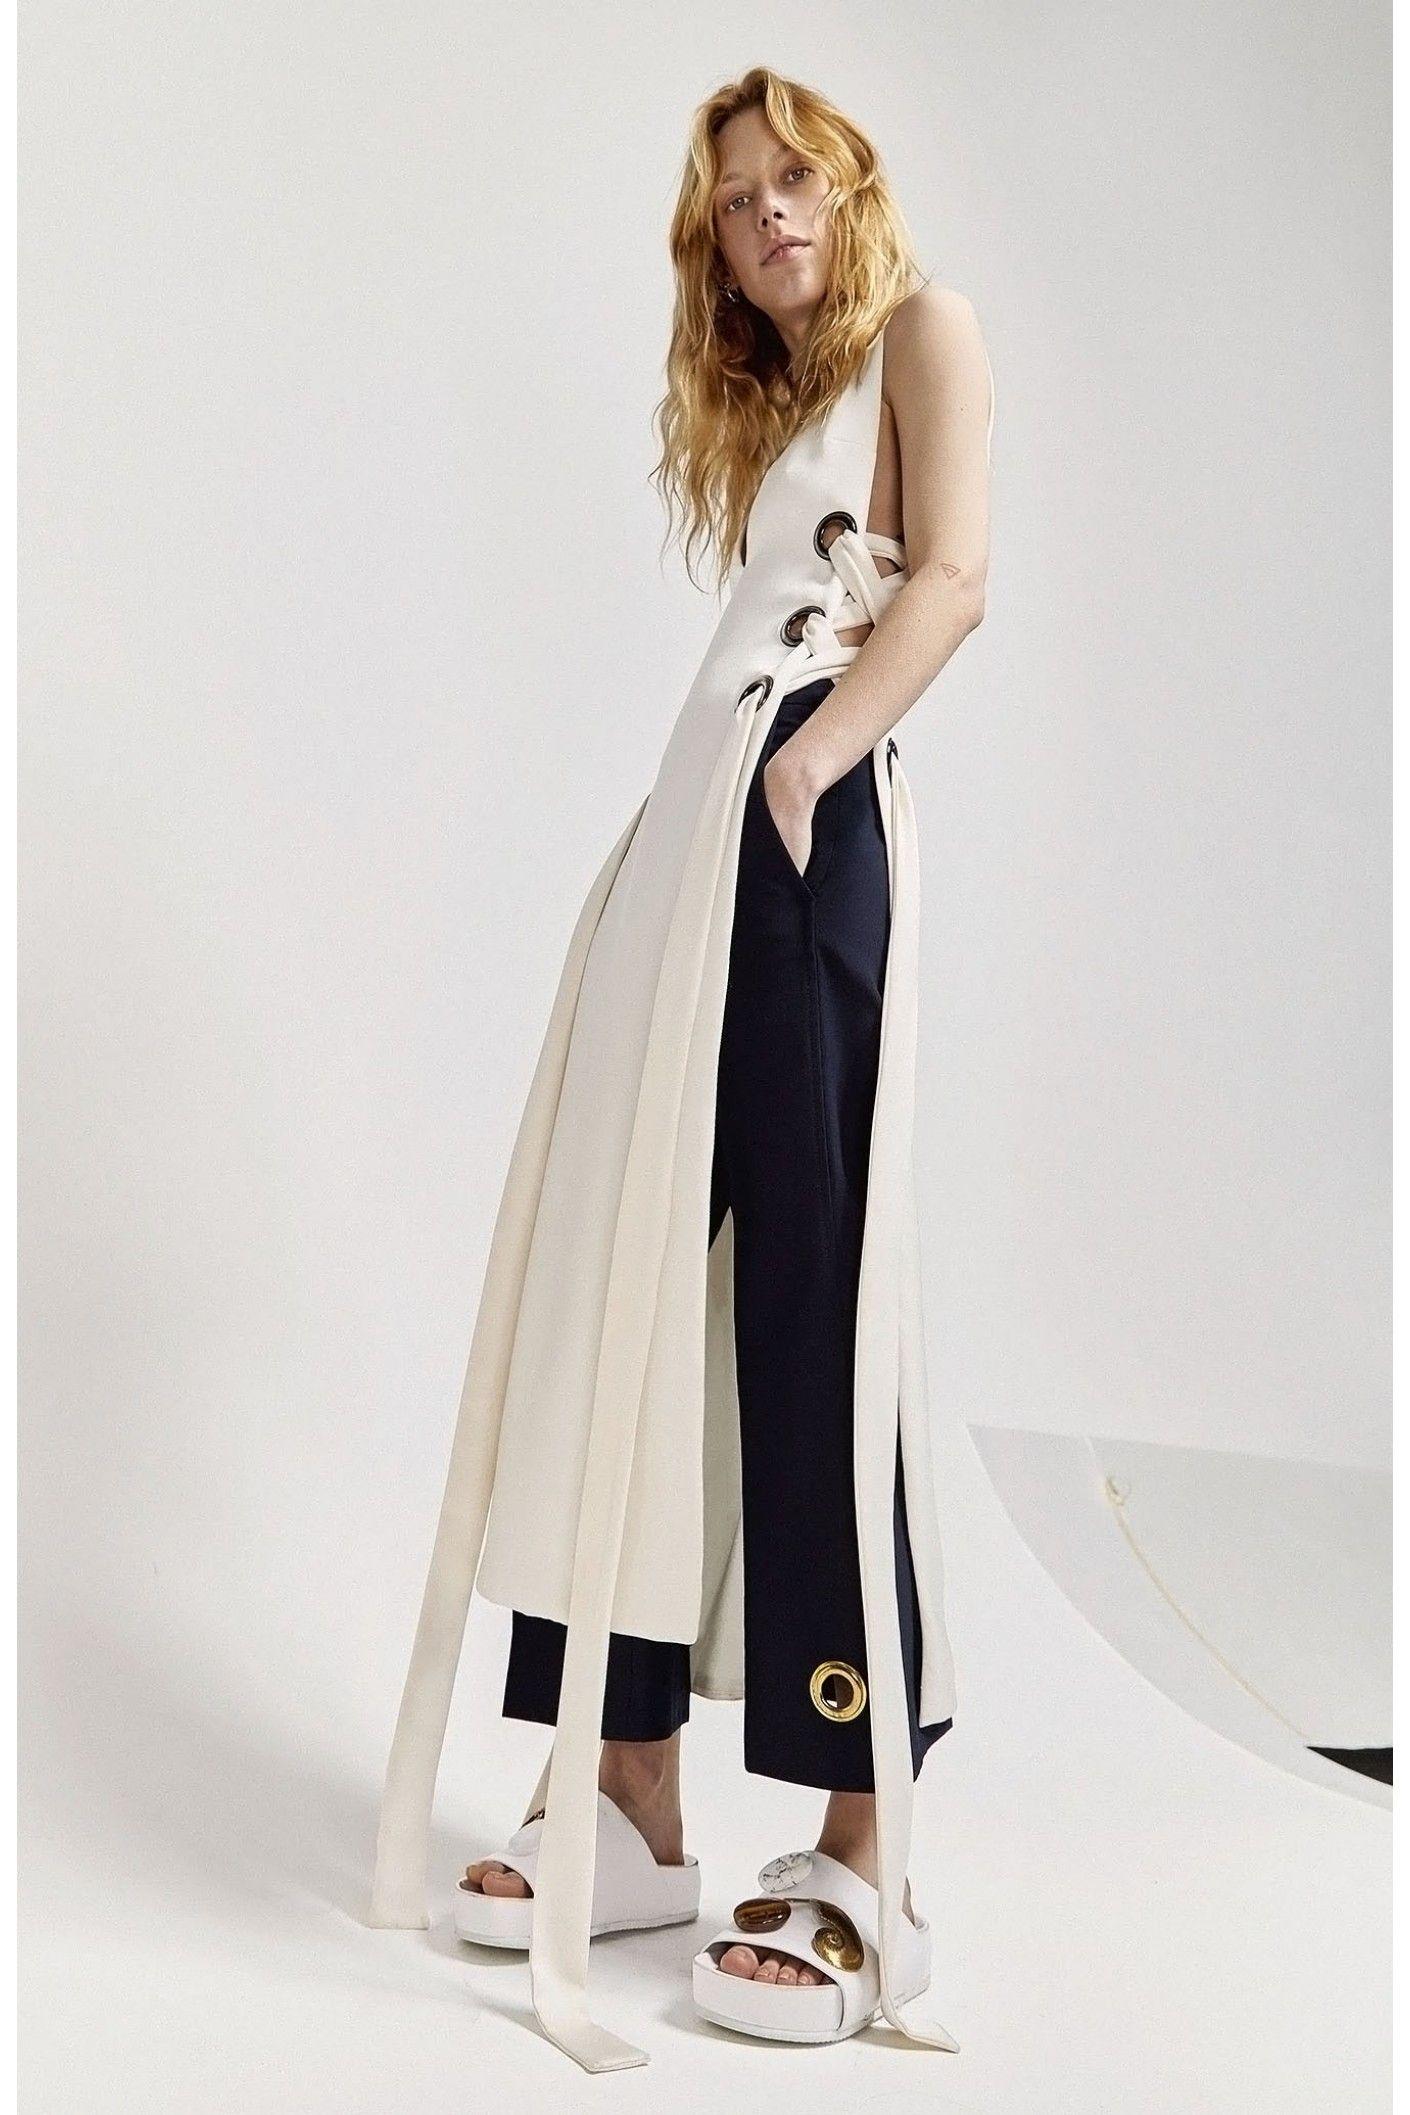 ELLERY - Cloudy Peak Dress Black - Luxury Fashion for ...